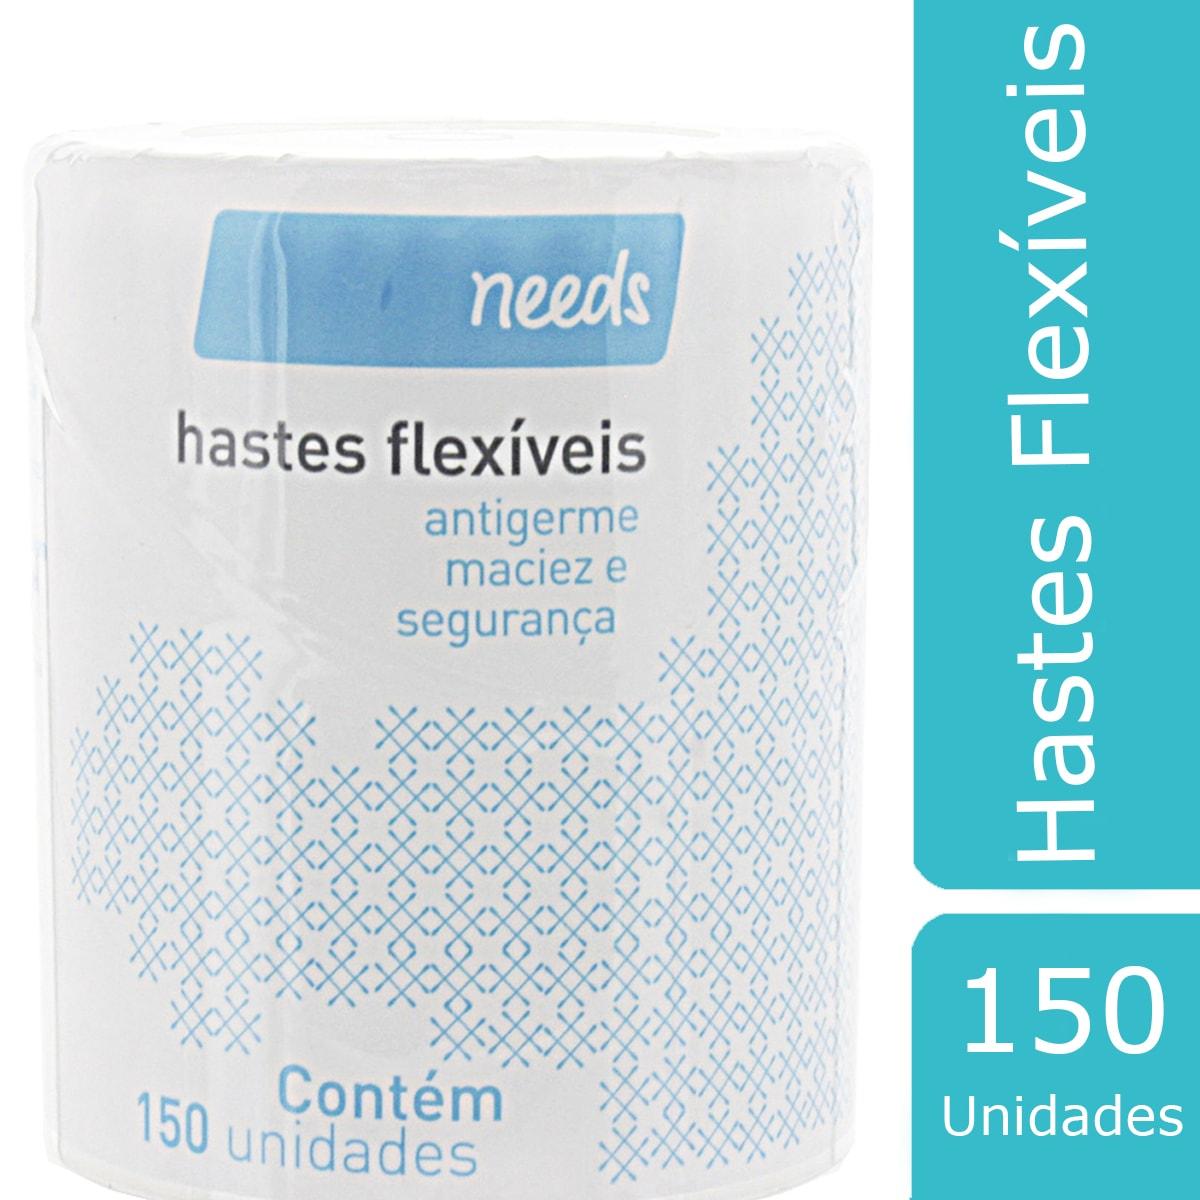 Hastes Flexíveis Needs Pote 150 Unidades